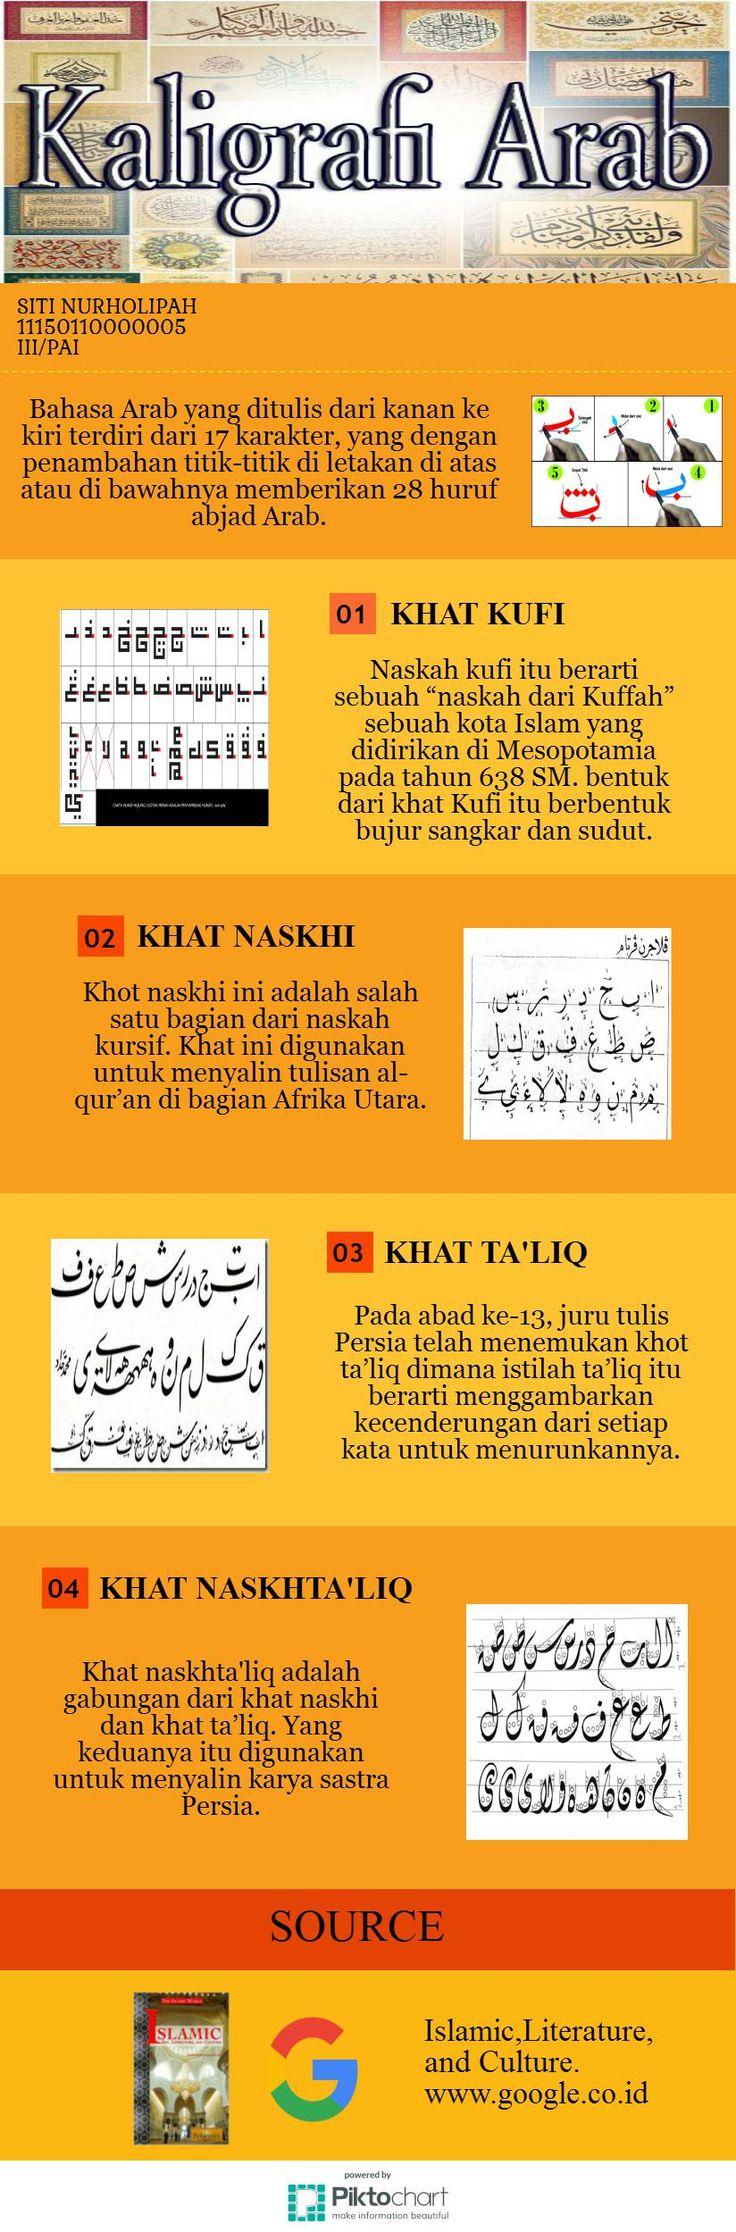 #kaligrafi #arab #kaligrafiarab #islam #caligraphy #islamic #art